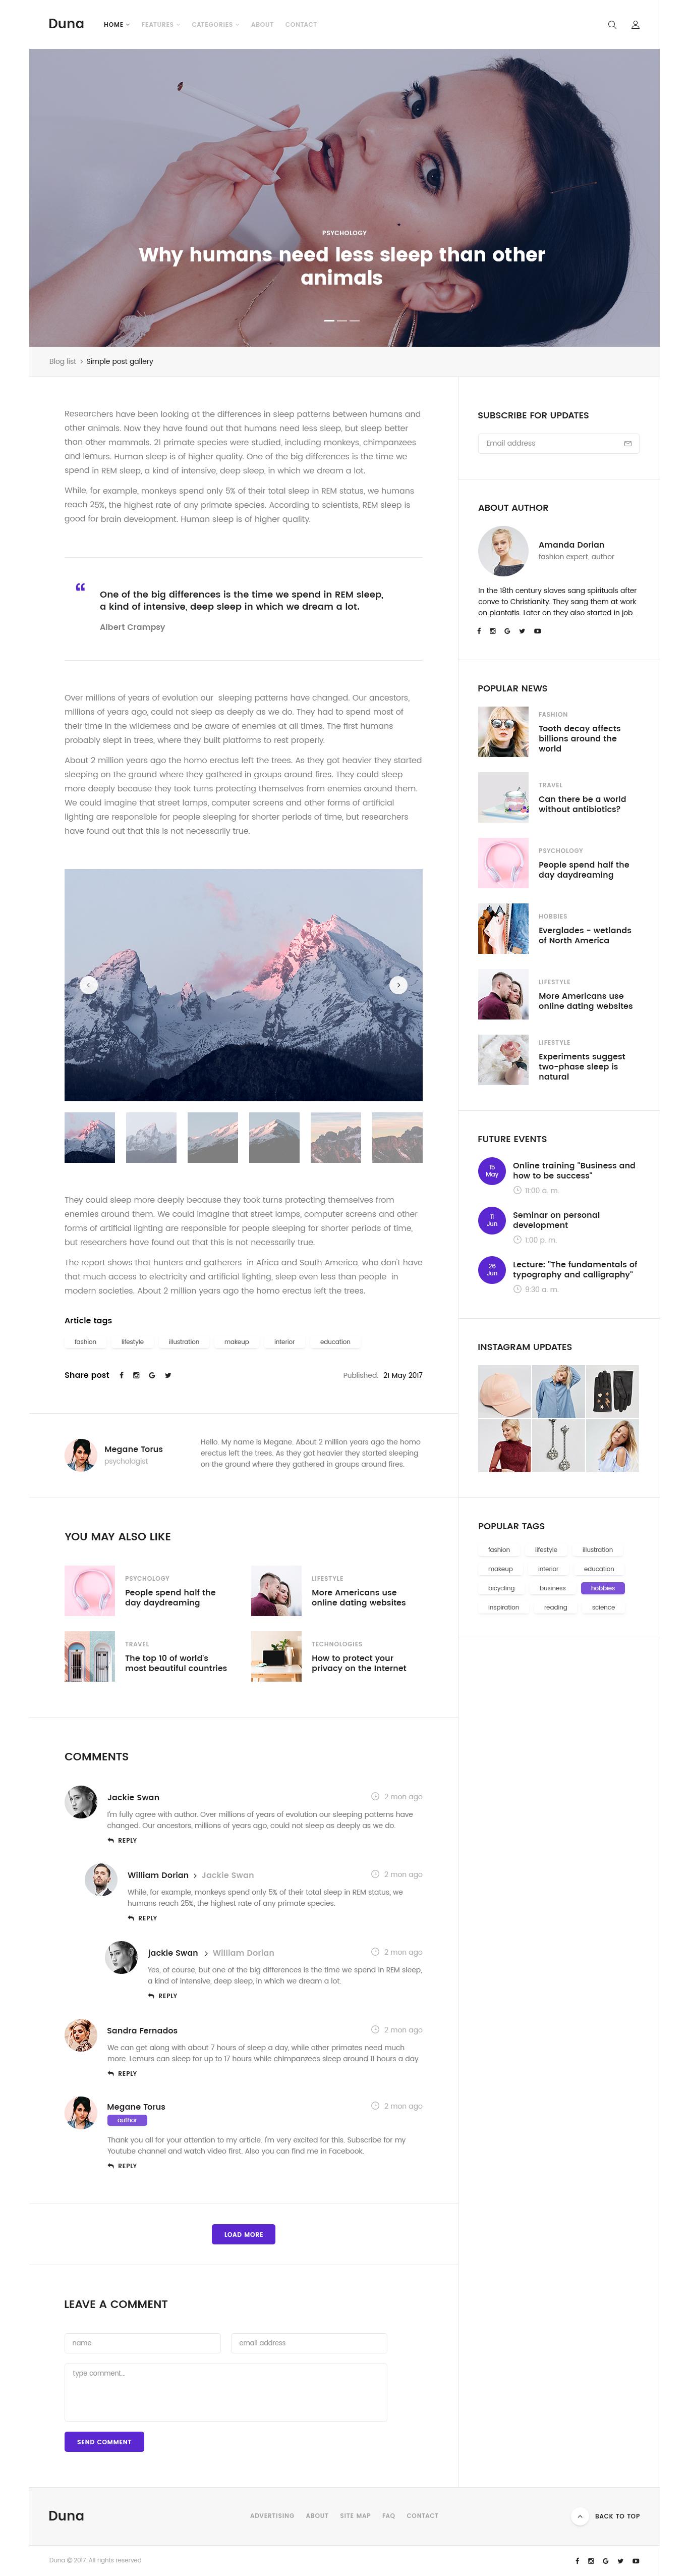 Duna - Blog & Magazine Template